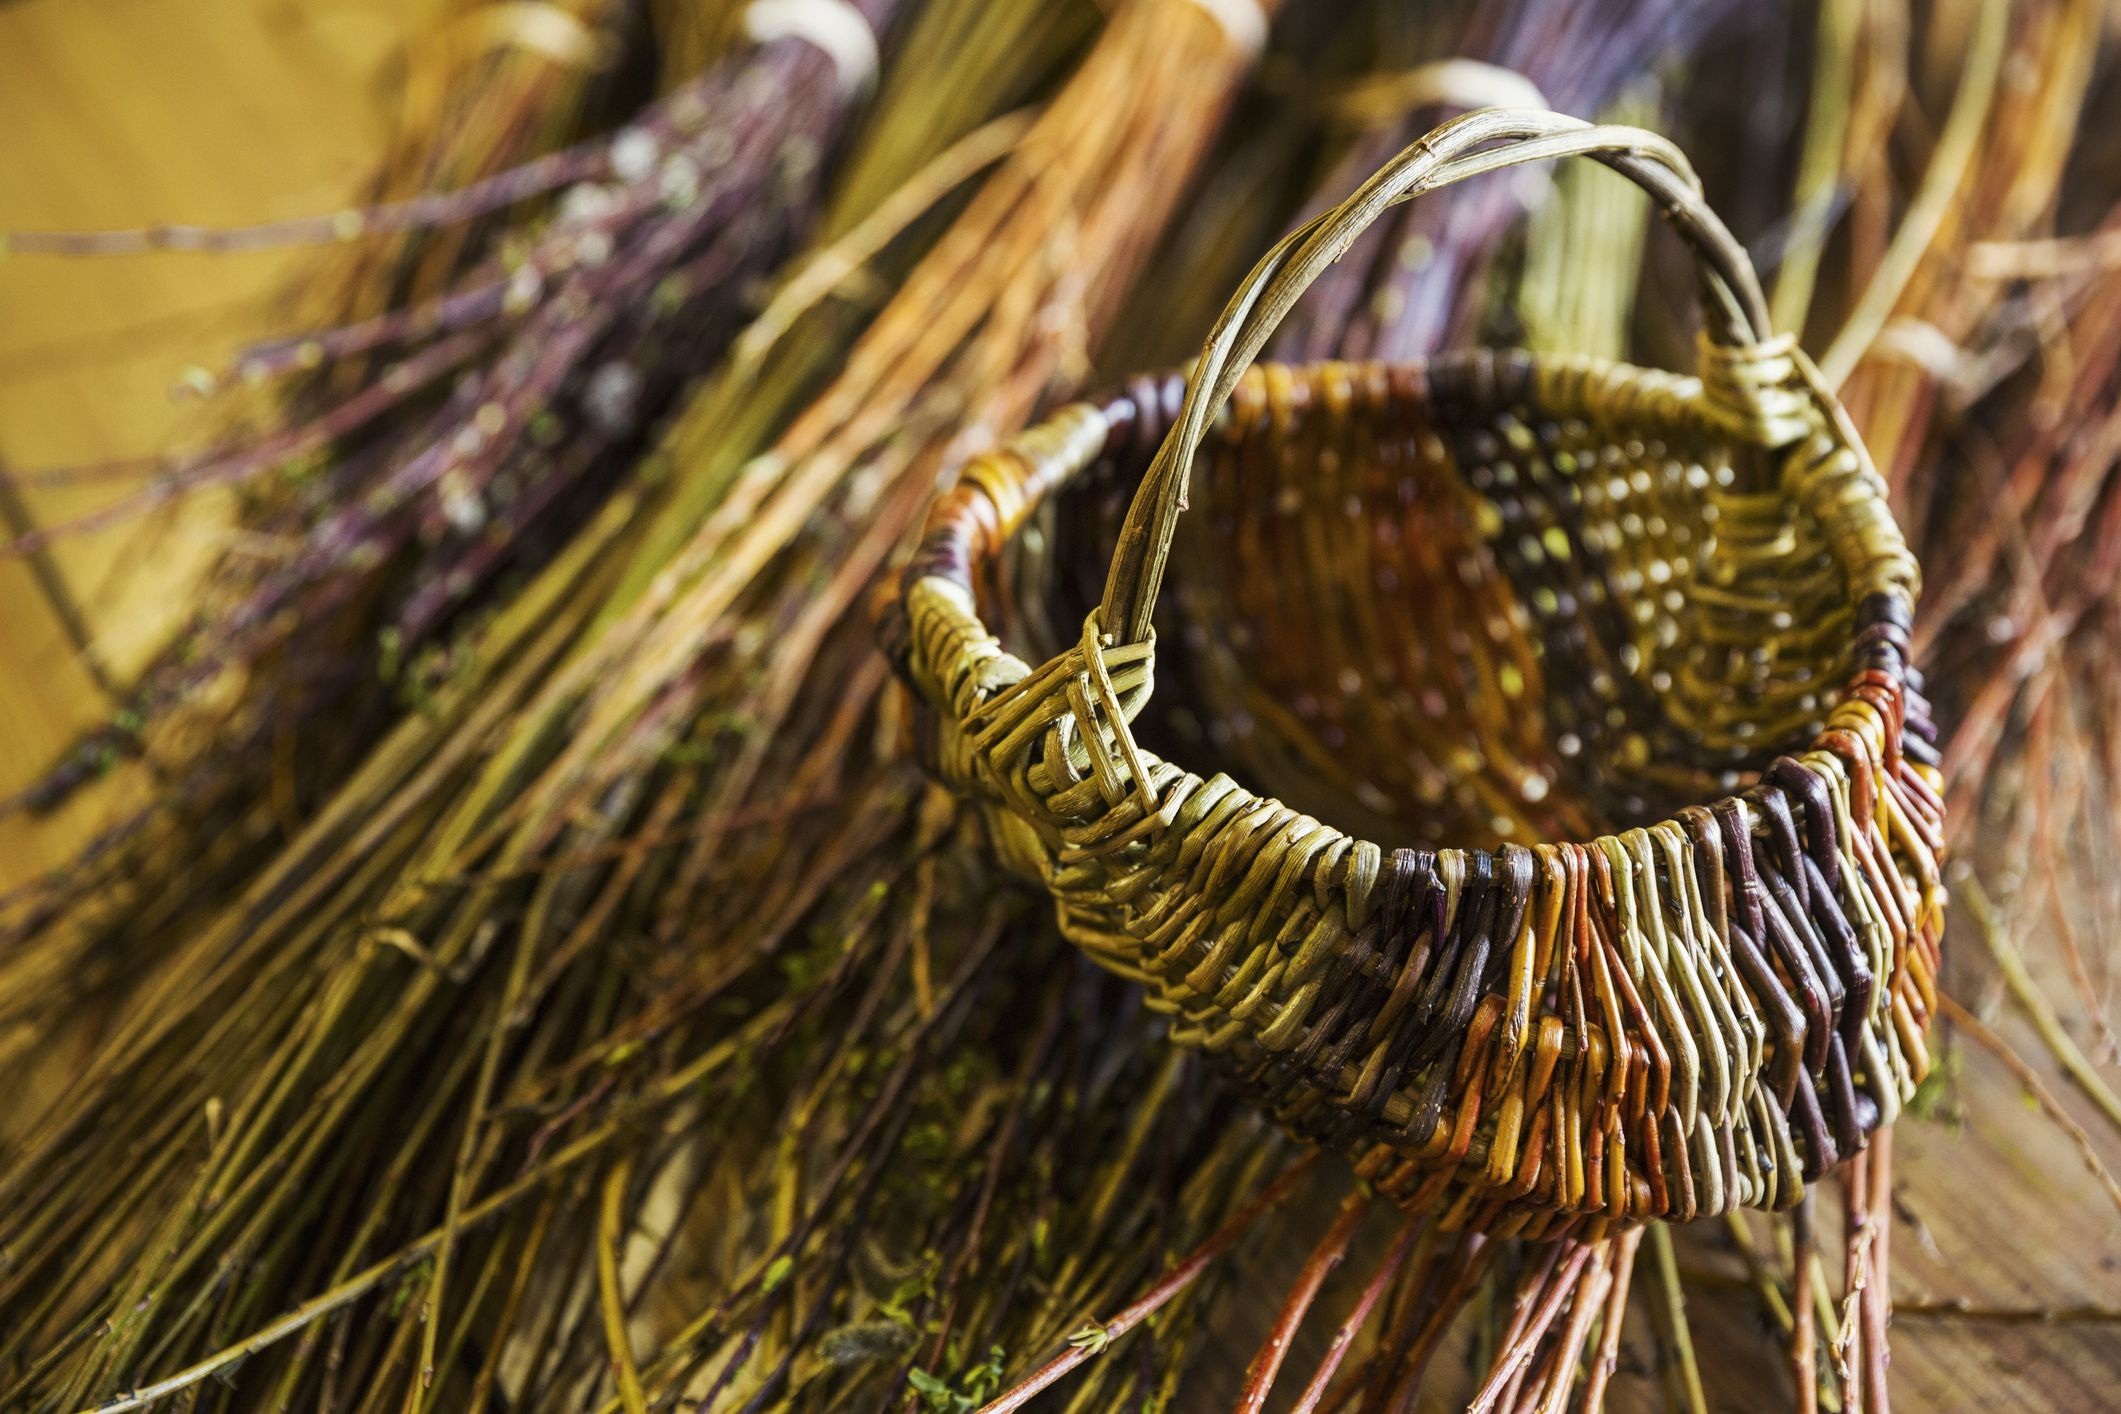 Learn To Make Weave A Range Of Miniature Baskets